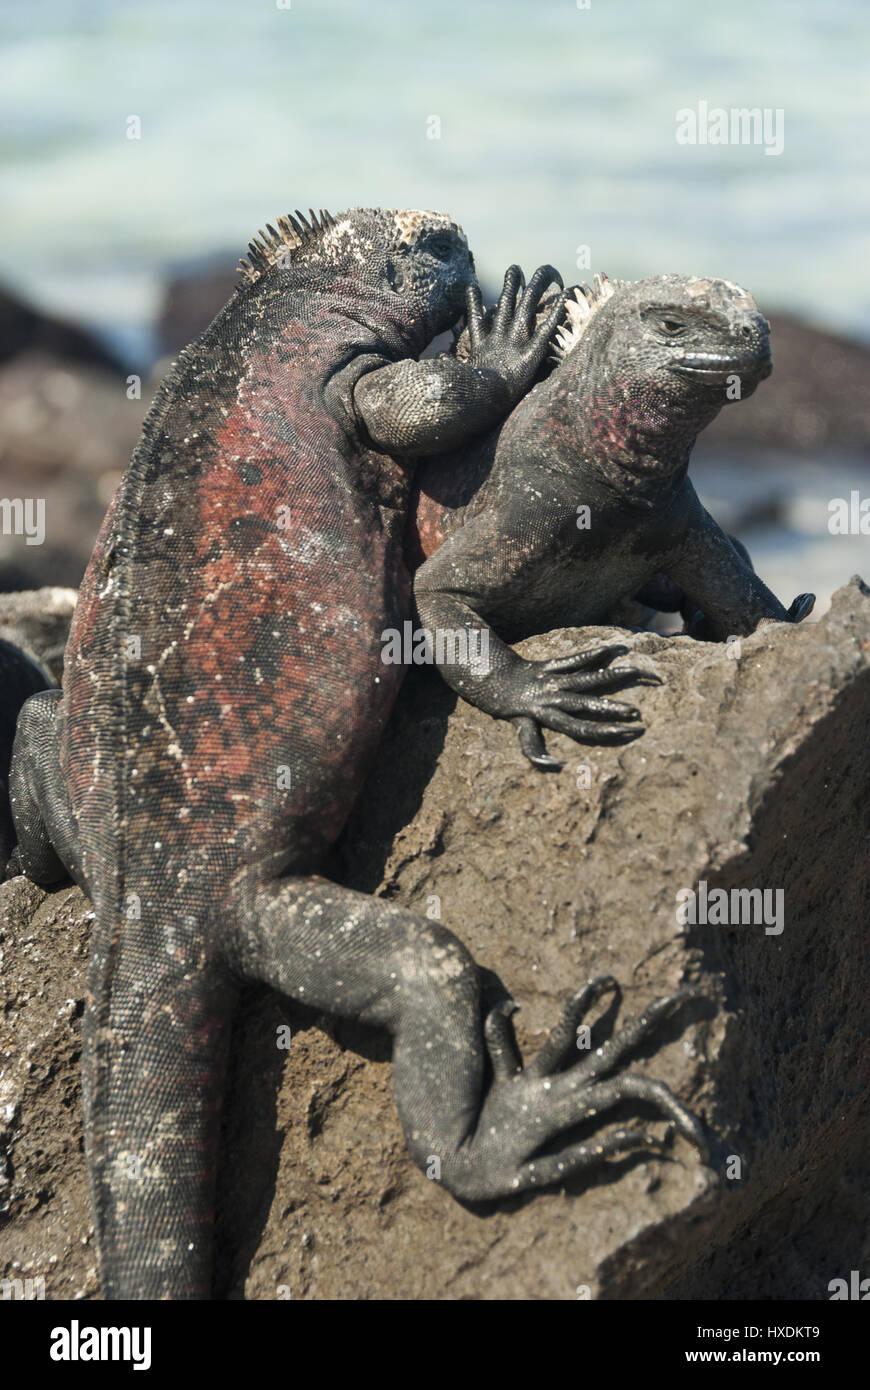 Ecuador, Galapagos, Espanola island, Gardner Bay, Marine iguanas - Stock Image